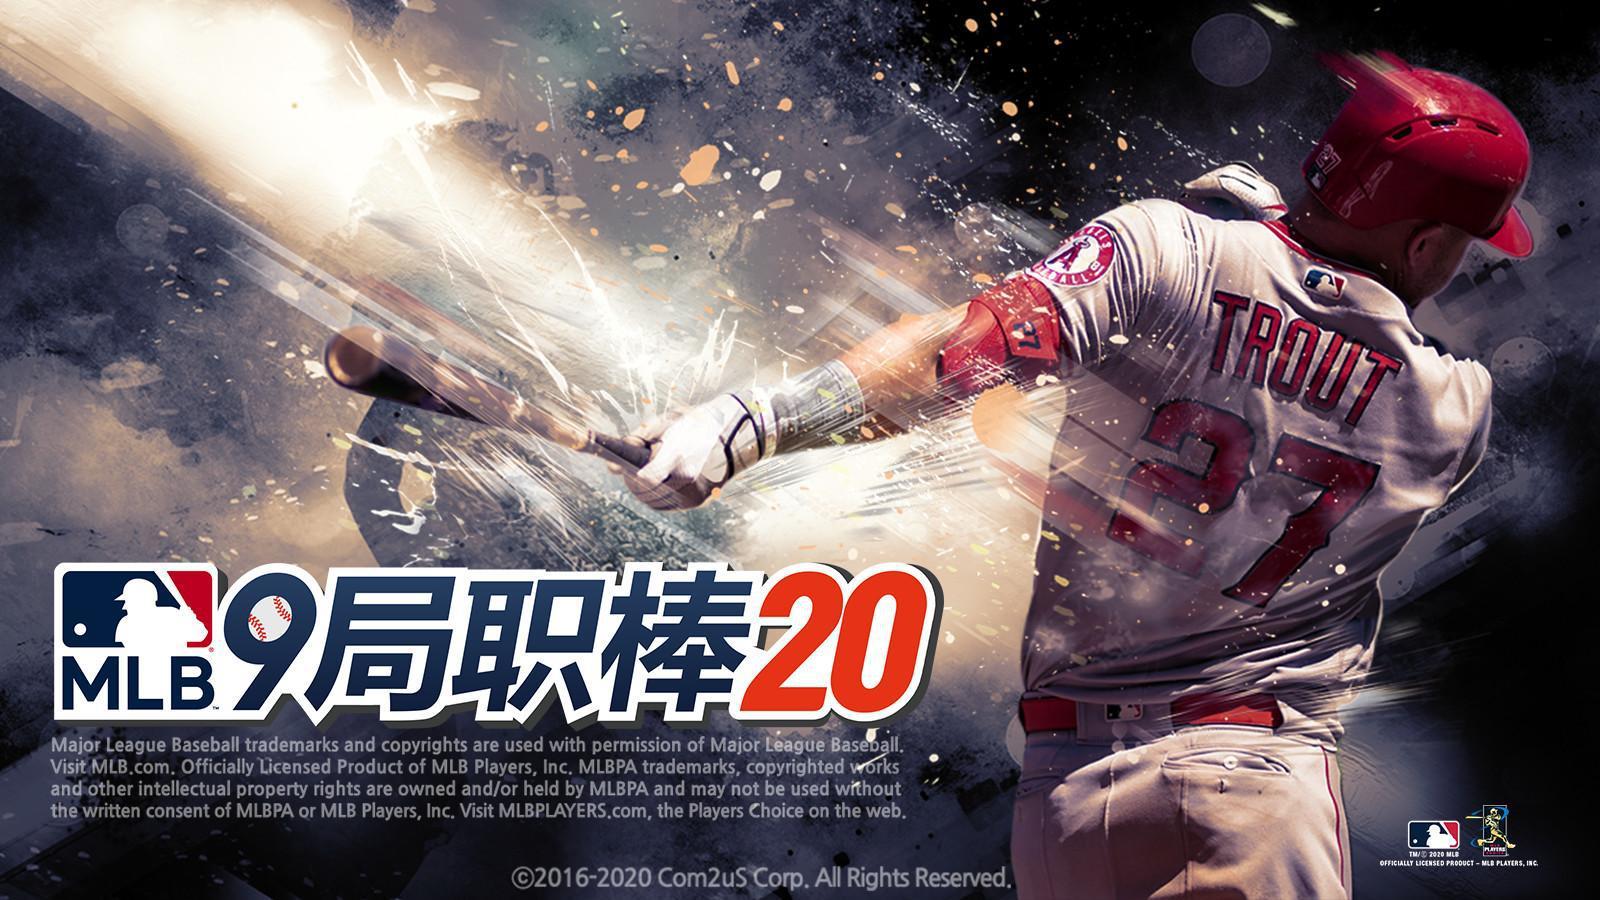 MLB:9局职棒19 游戏截图1